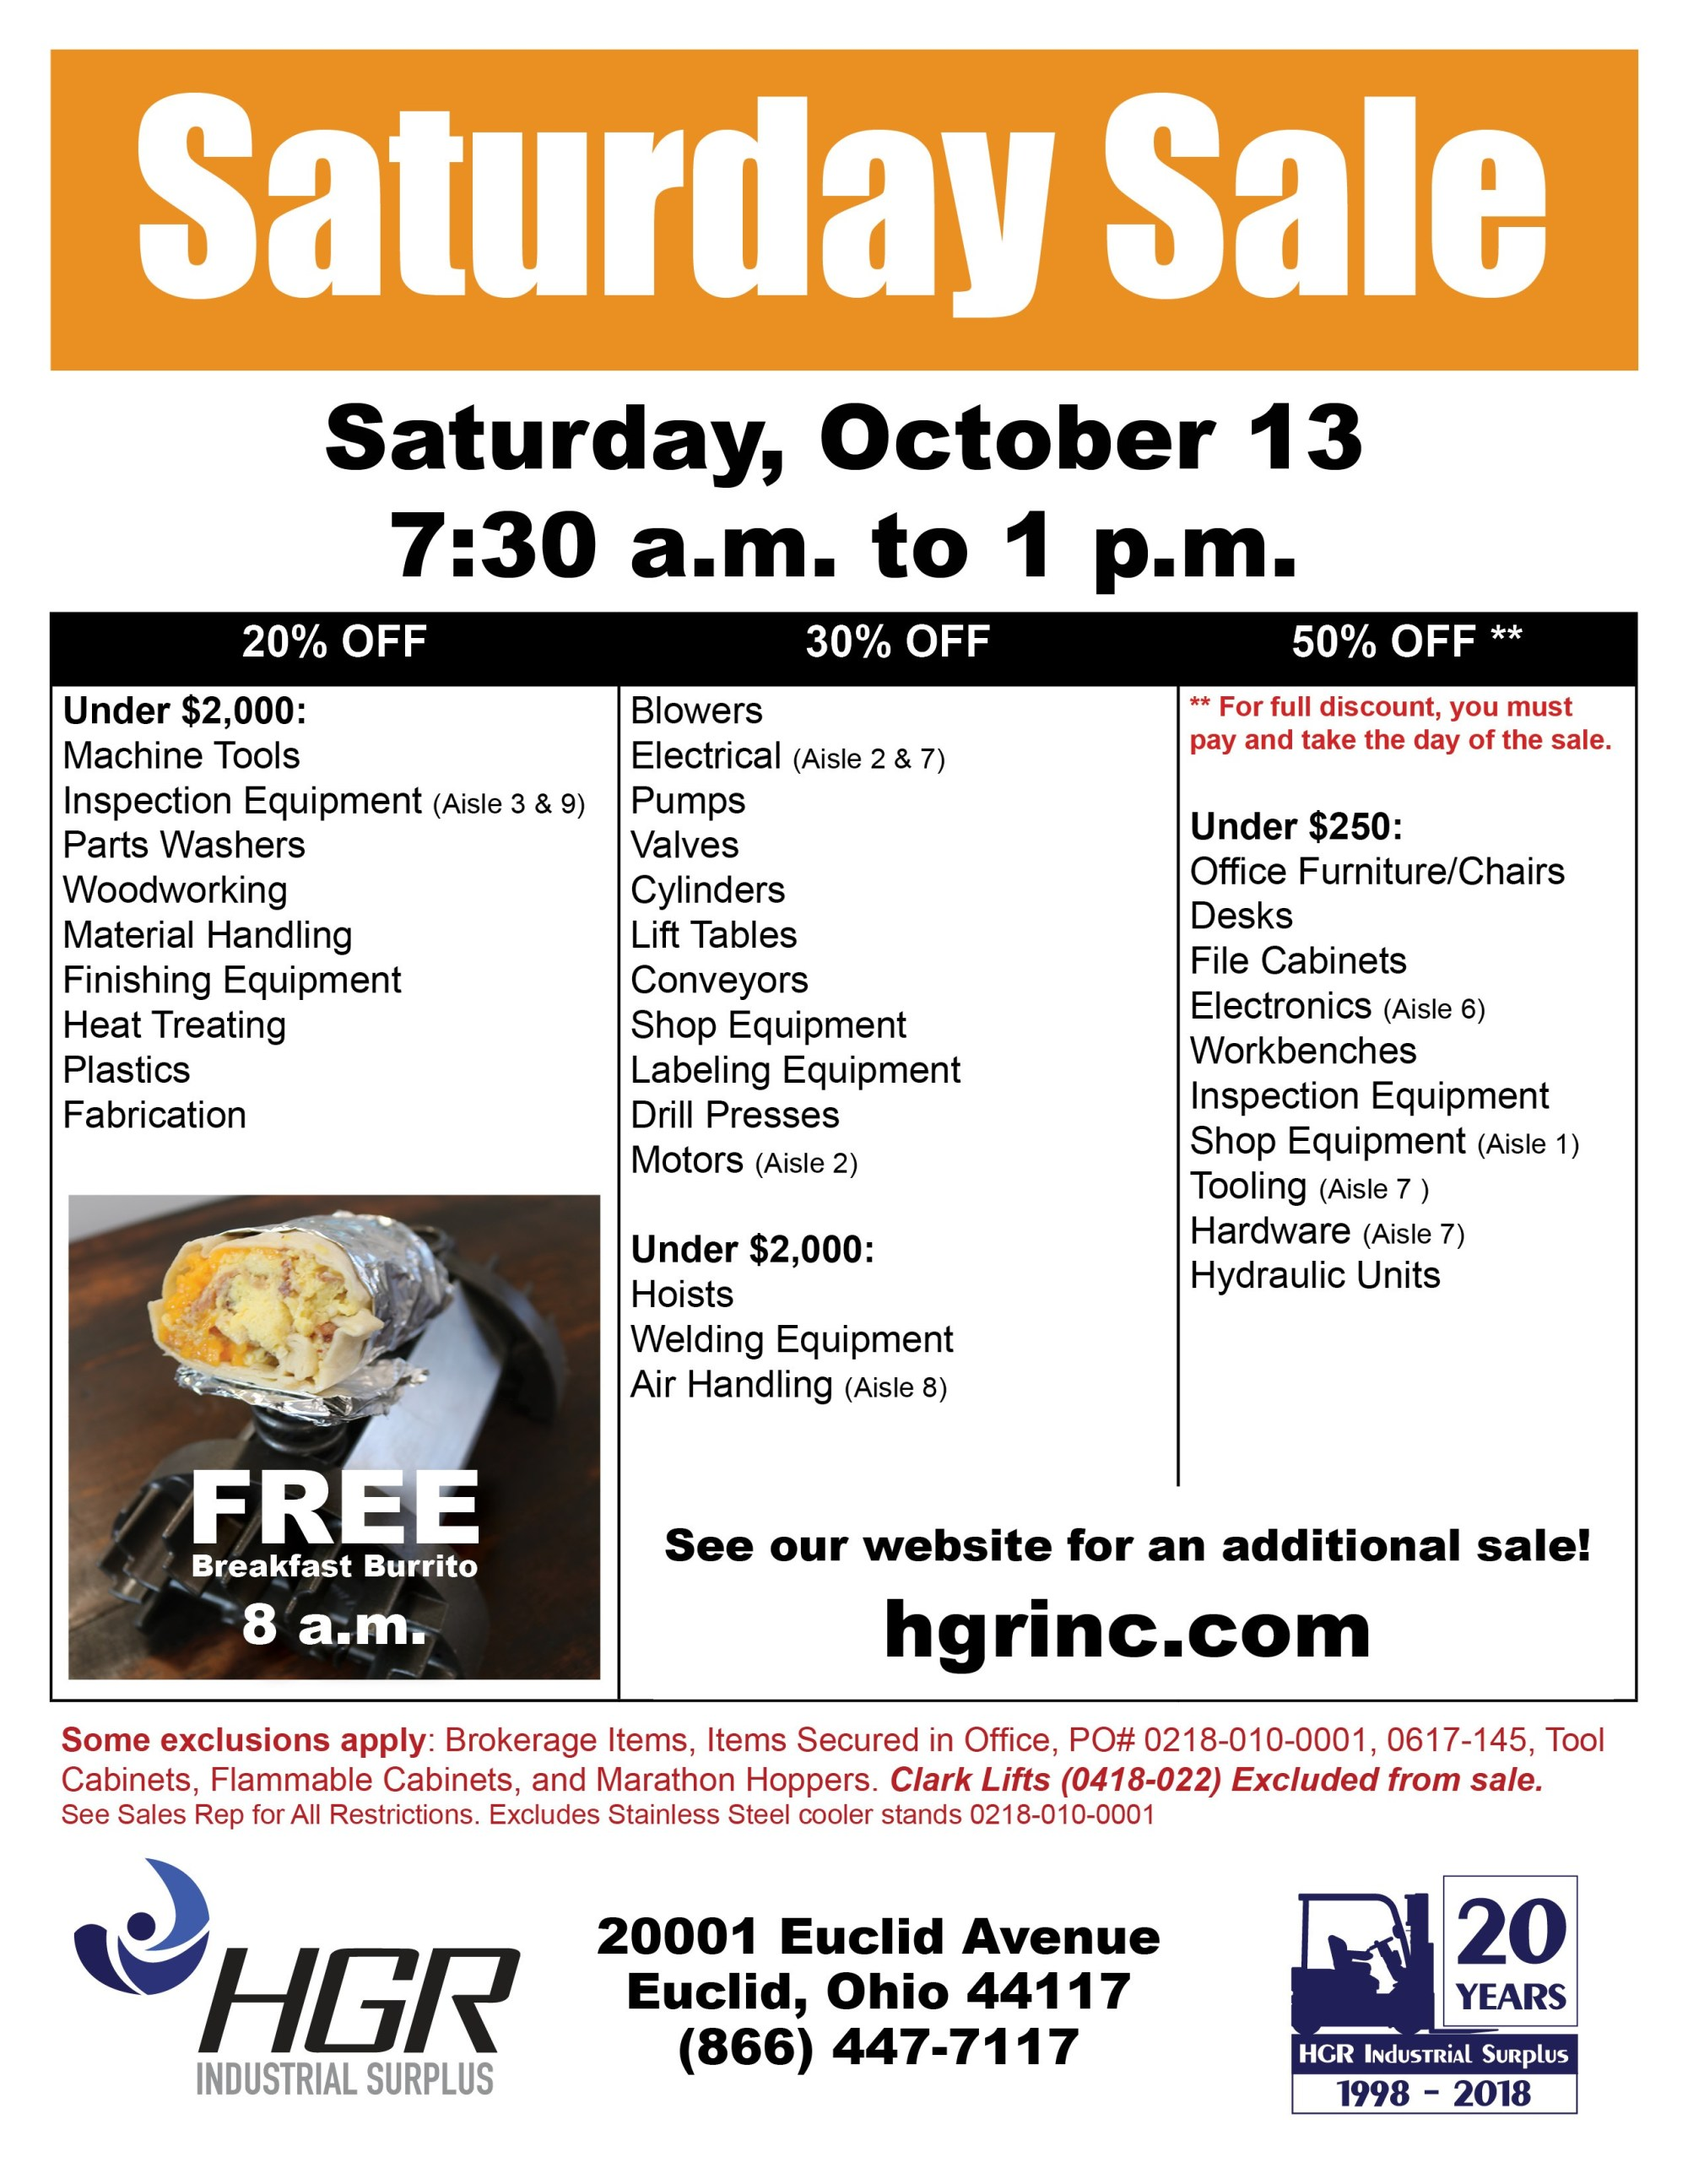 hight resolution of hgr industrial surplus october 2018 saturday sale flyer